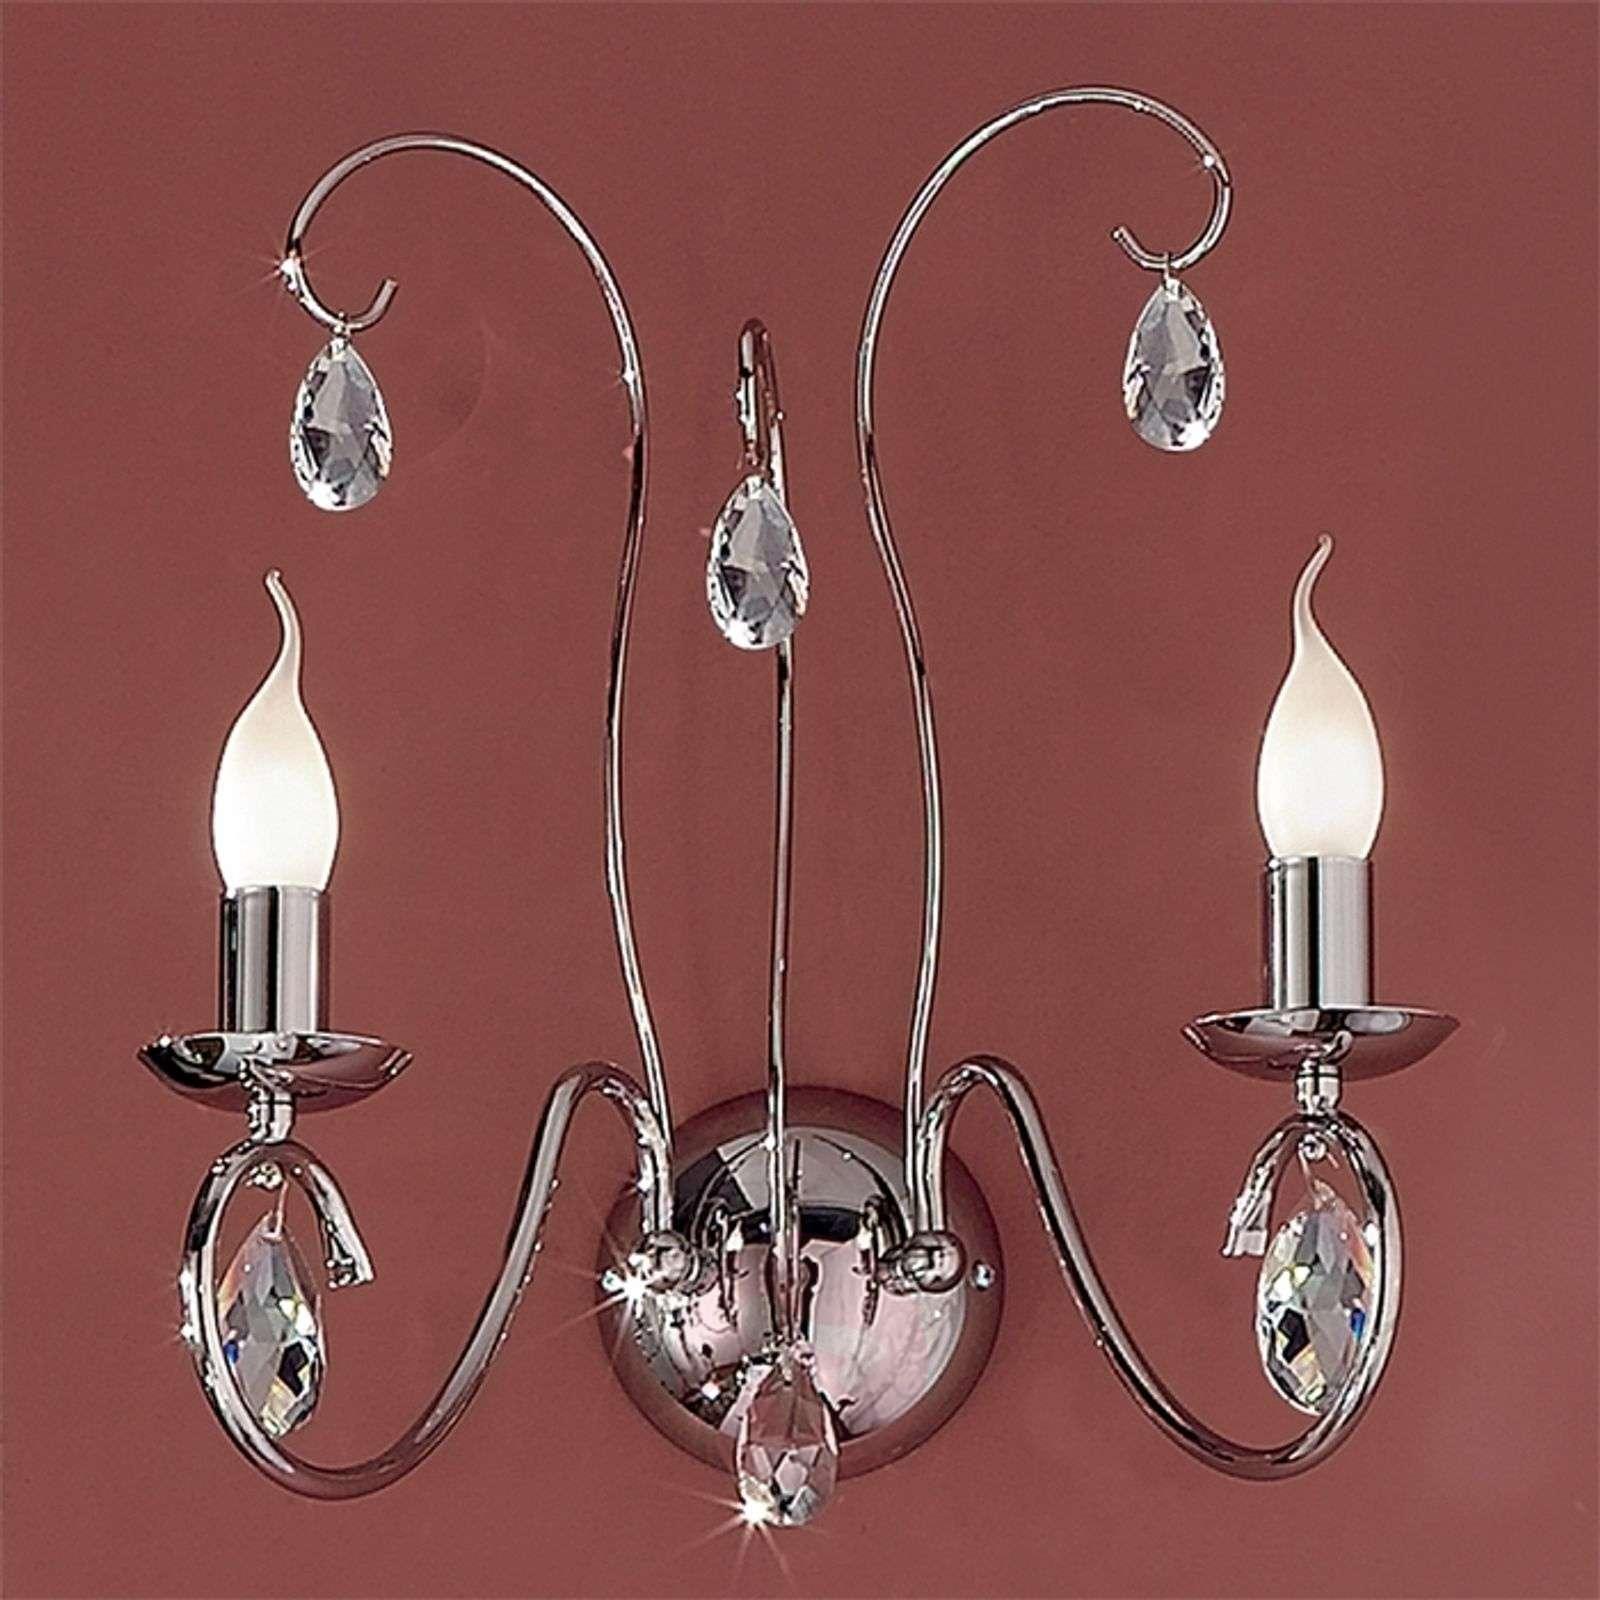 Fioretto Wall Light Graceful Two Bulbs Chrome-7253037-01